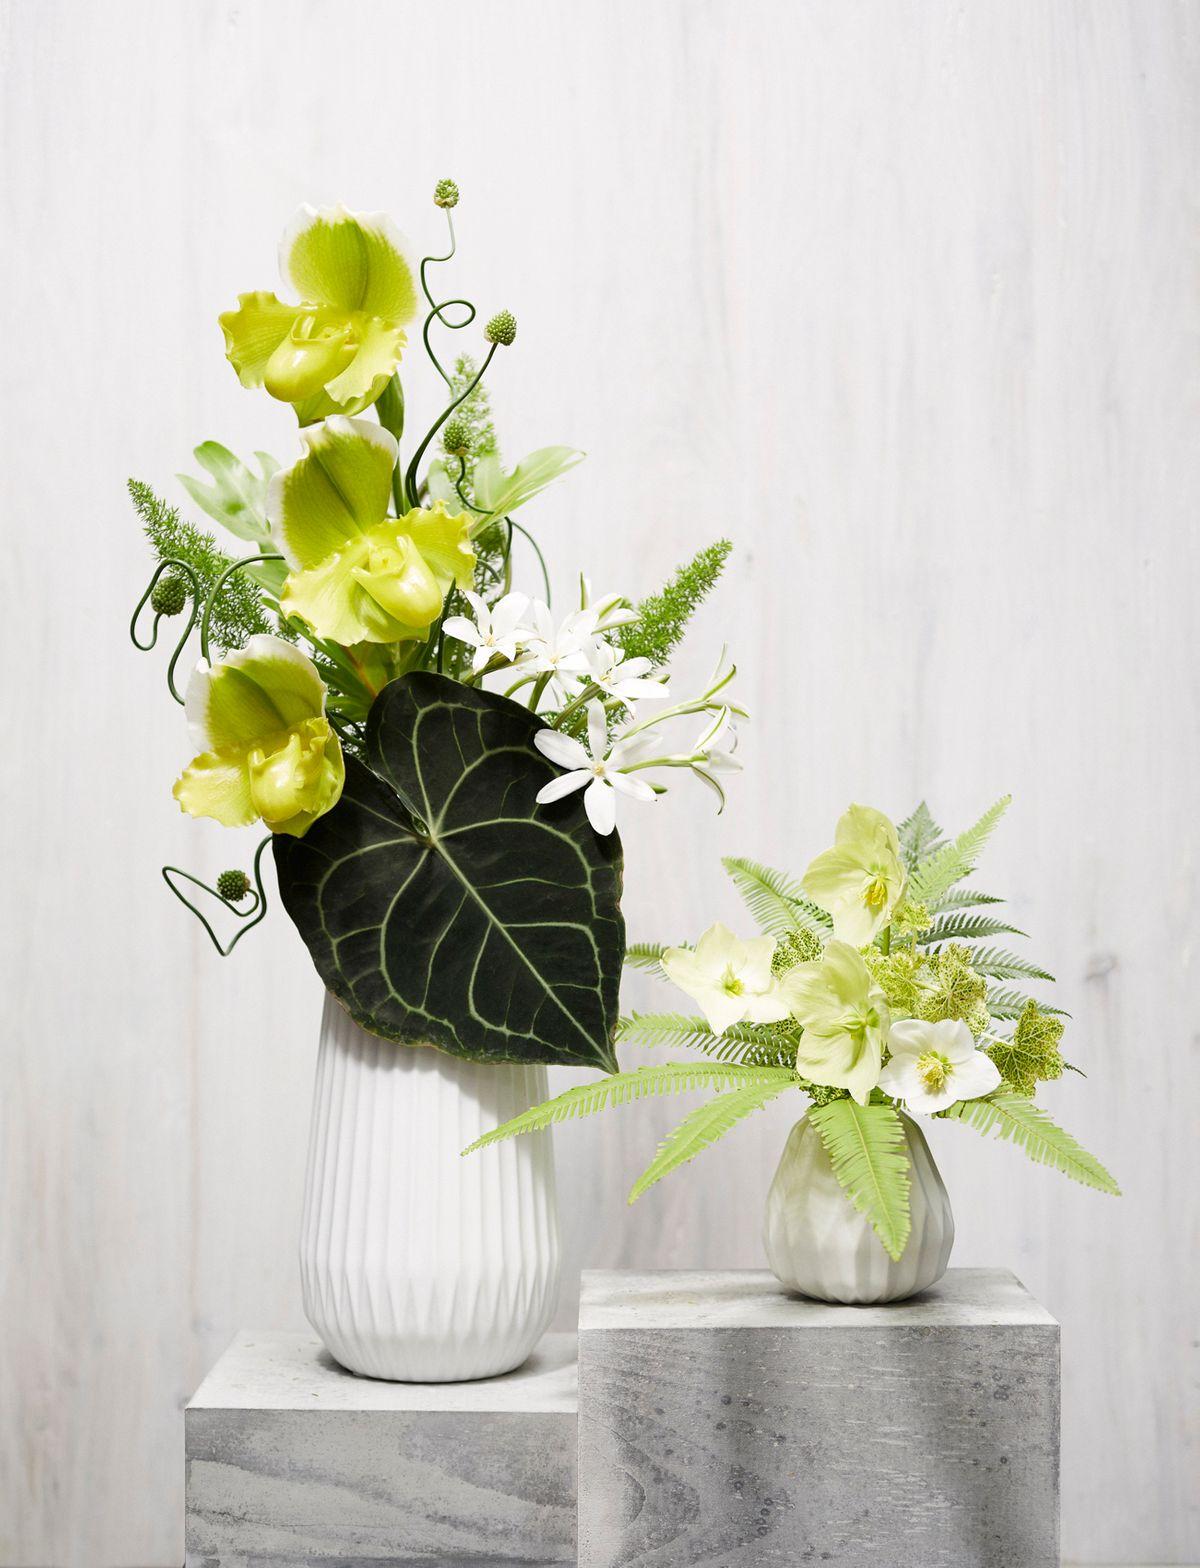 ChristopherWhite_Floral Study_4.jpg